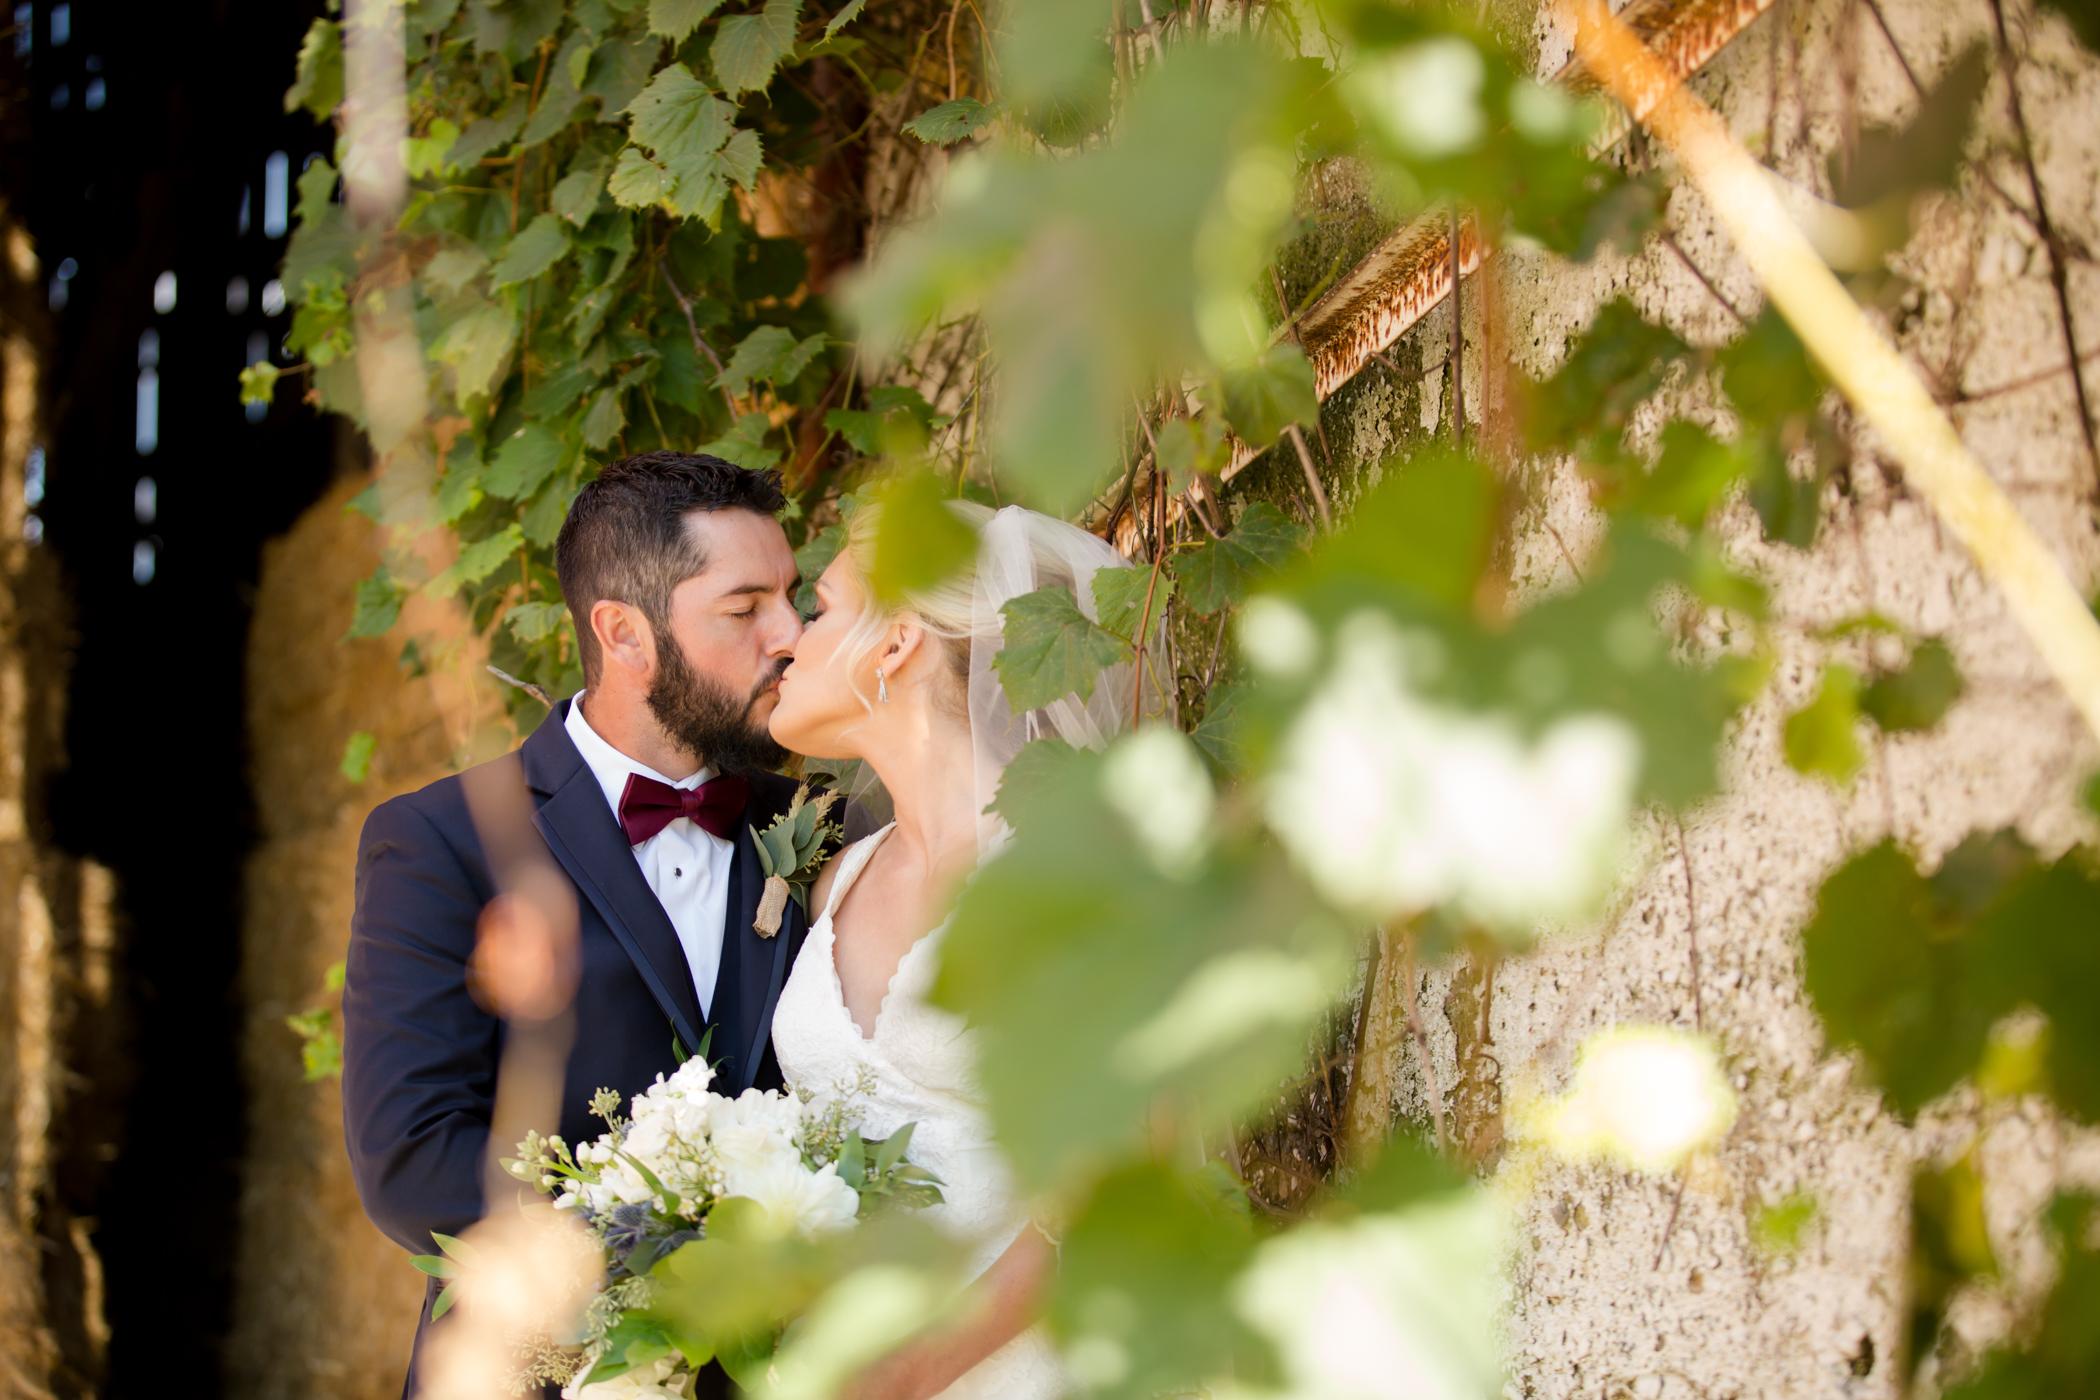 Brander_Bride+Groom_Allison Clark Photog